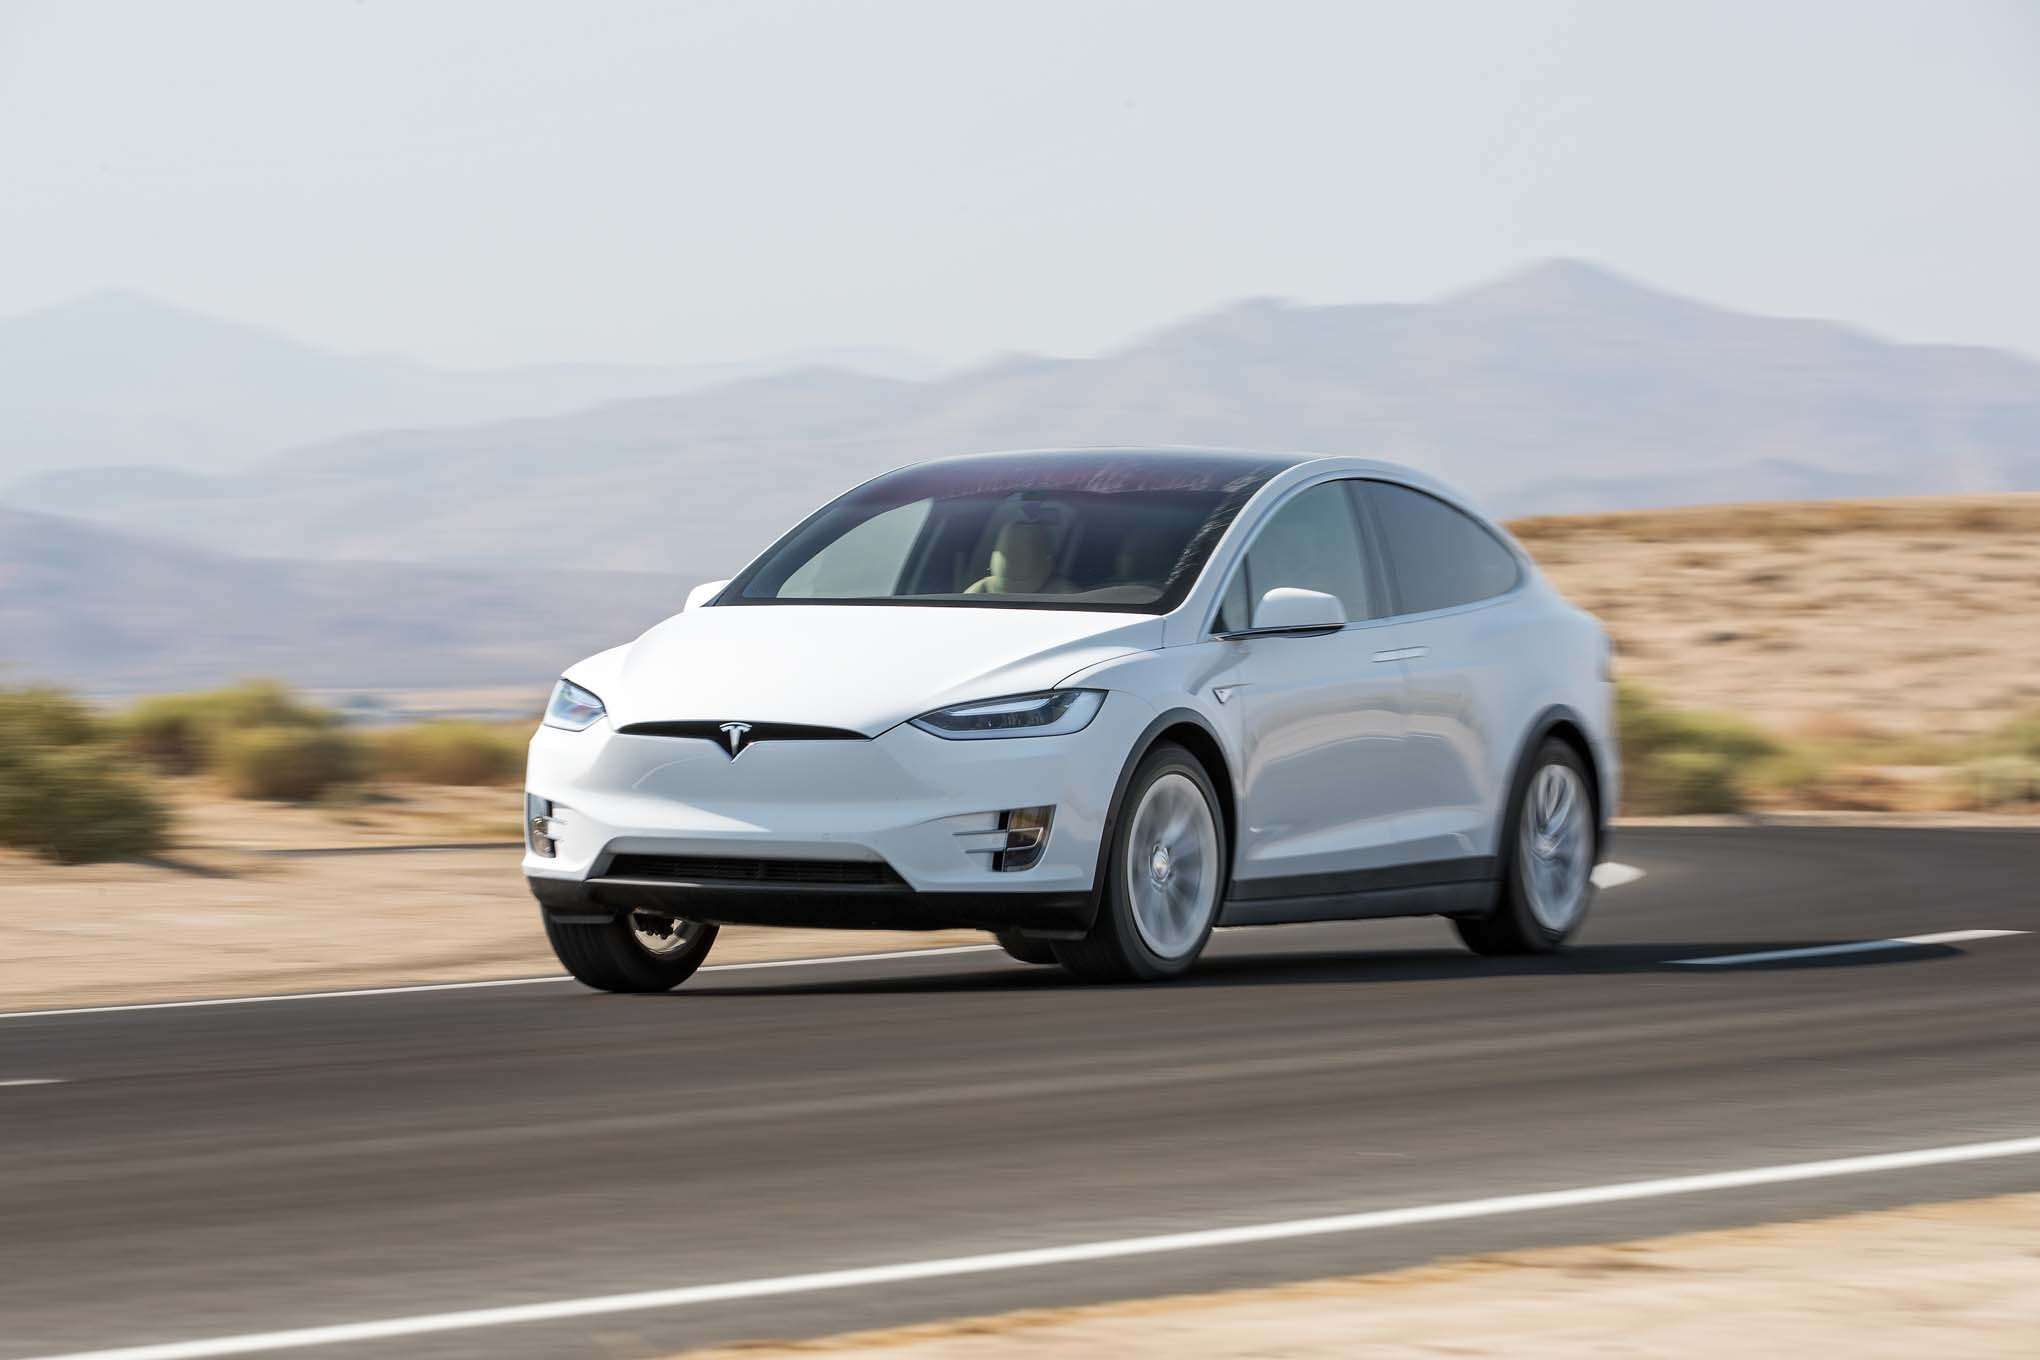 2016 Tesla Model X 75d Front Three Quarter In Motion 02